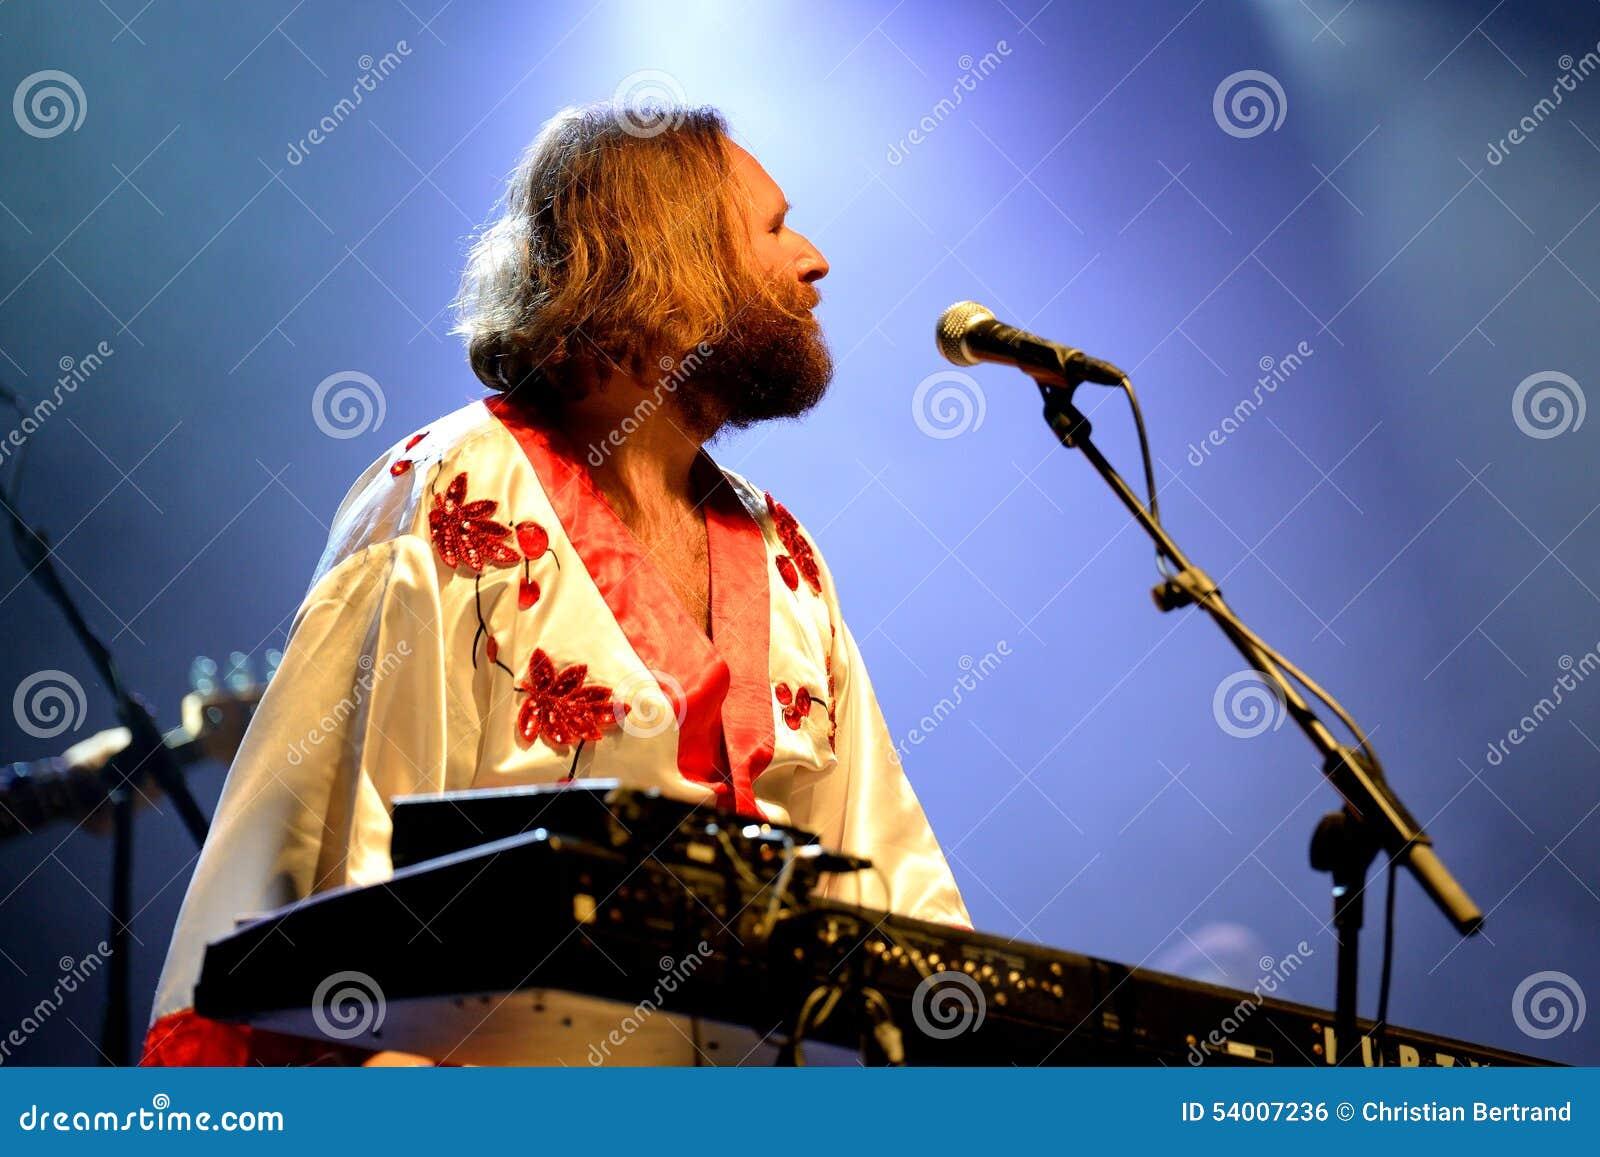 Bjorn Again (tributo da faixa a ABBA) executa no festival dourado do renascimento